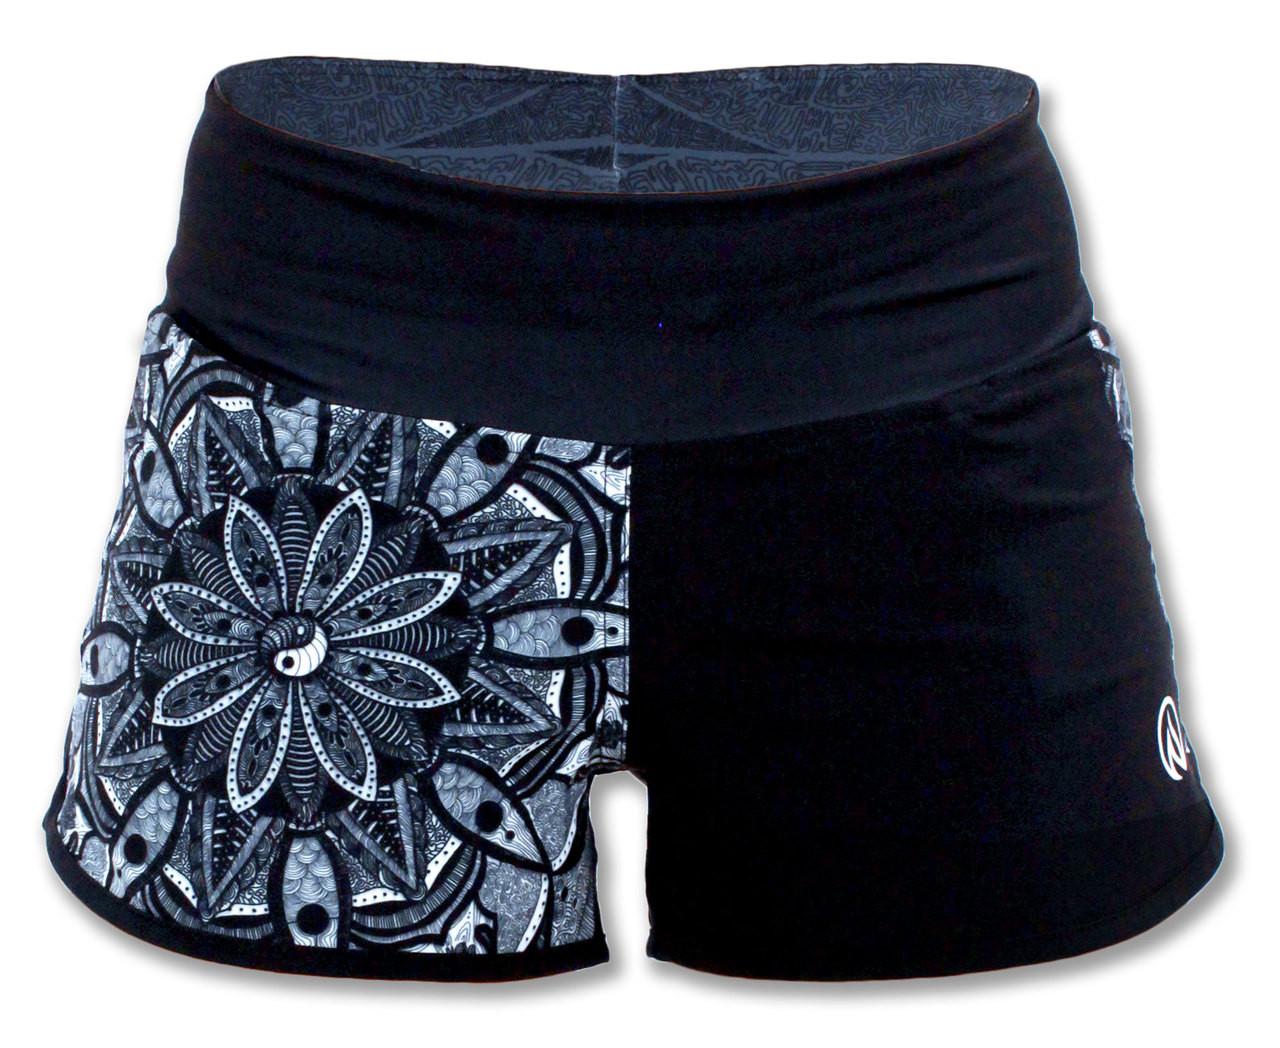 INKnBURN Healing Mandala Shorts Front Waistband Up